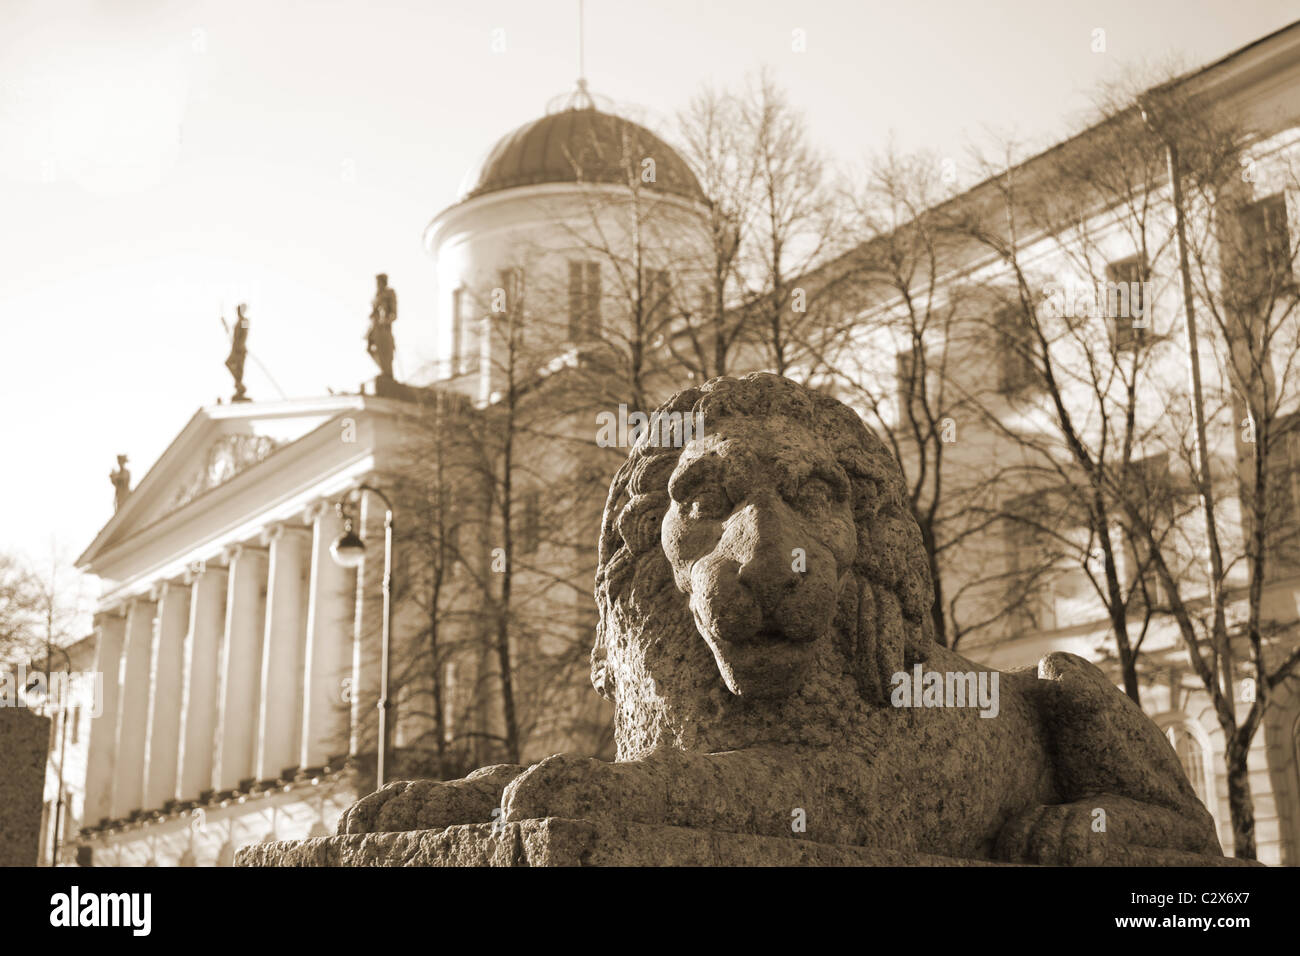 Institute of Russian Literature (the Pushkin House). St.Petersburg, Russia. - Stock Image